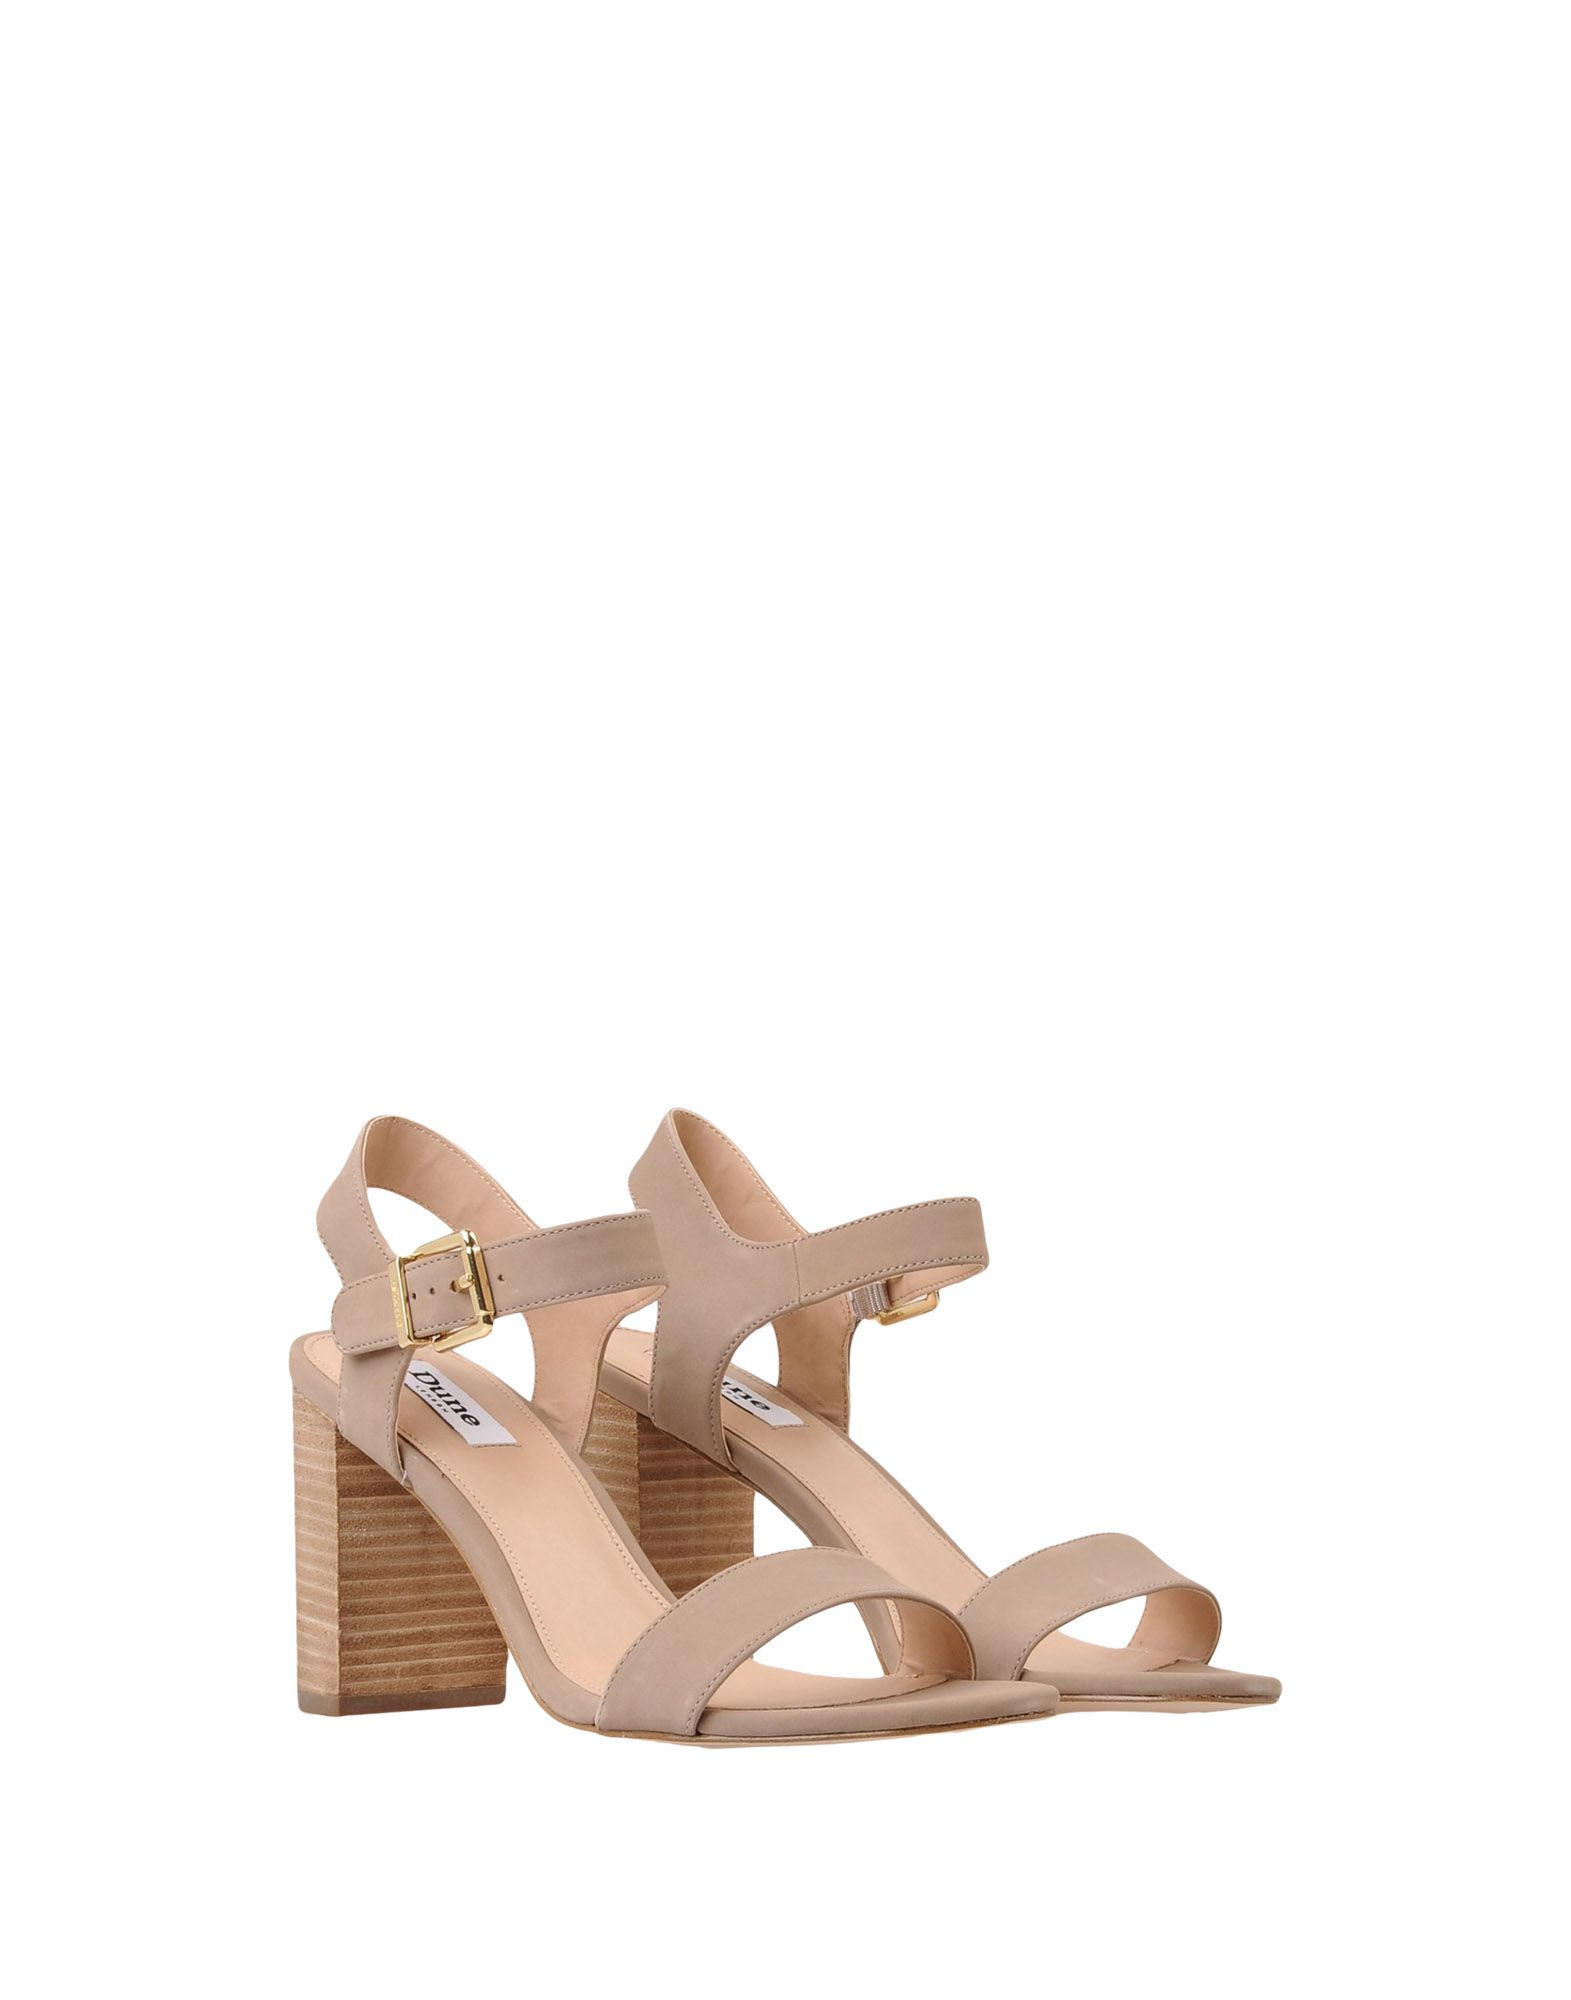 Dune London Isobel Schuhe  11451416UU Gute Qualität beliebte Schuhe Isobel 175e4c